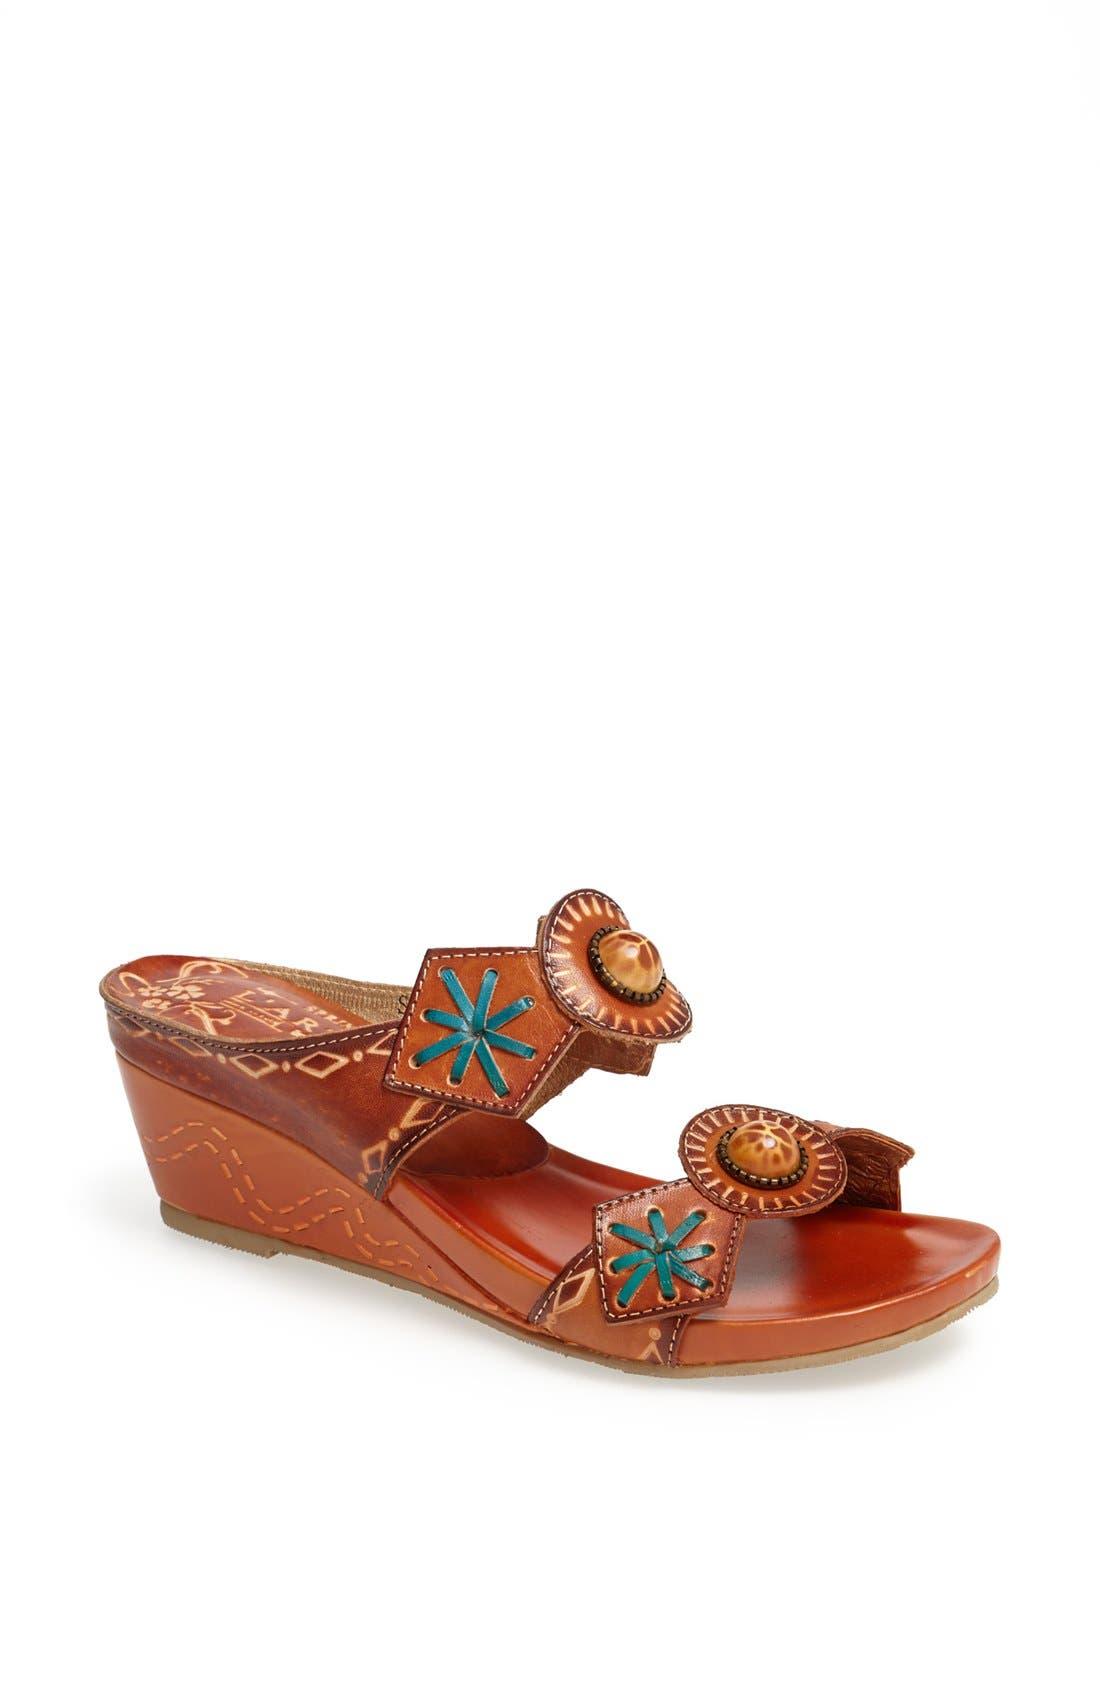 Main Image - Spring Step 'Sesame' Leather Wedge Sandal